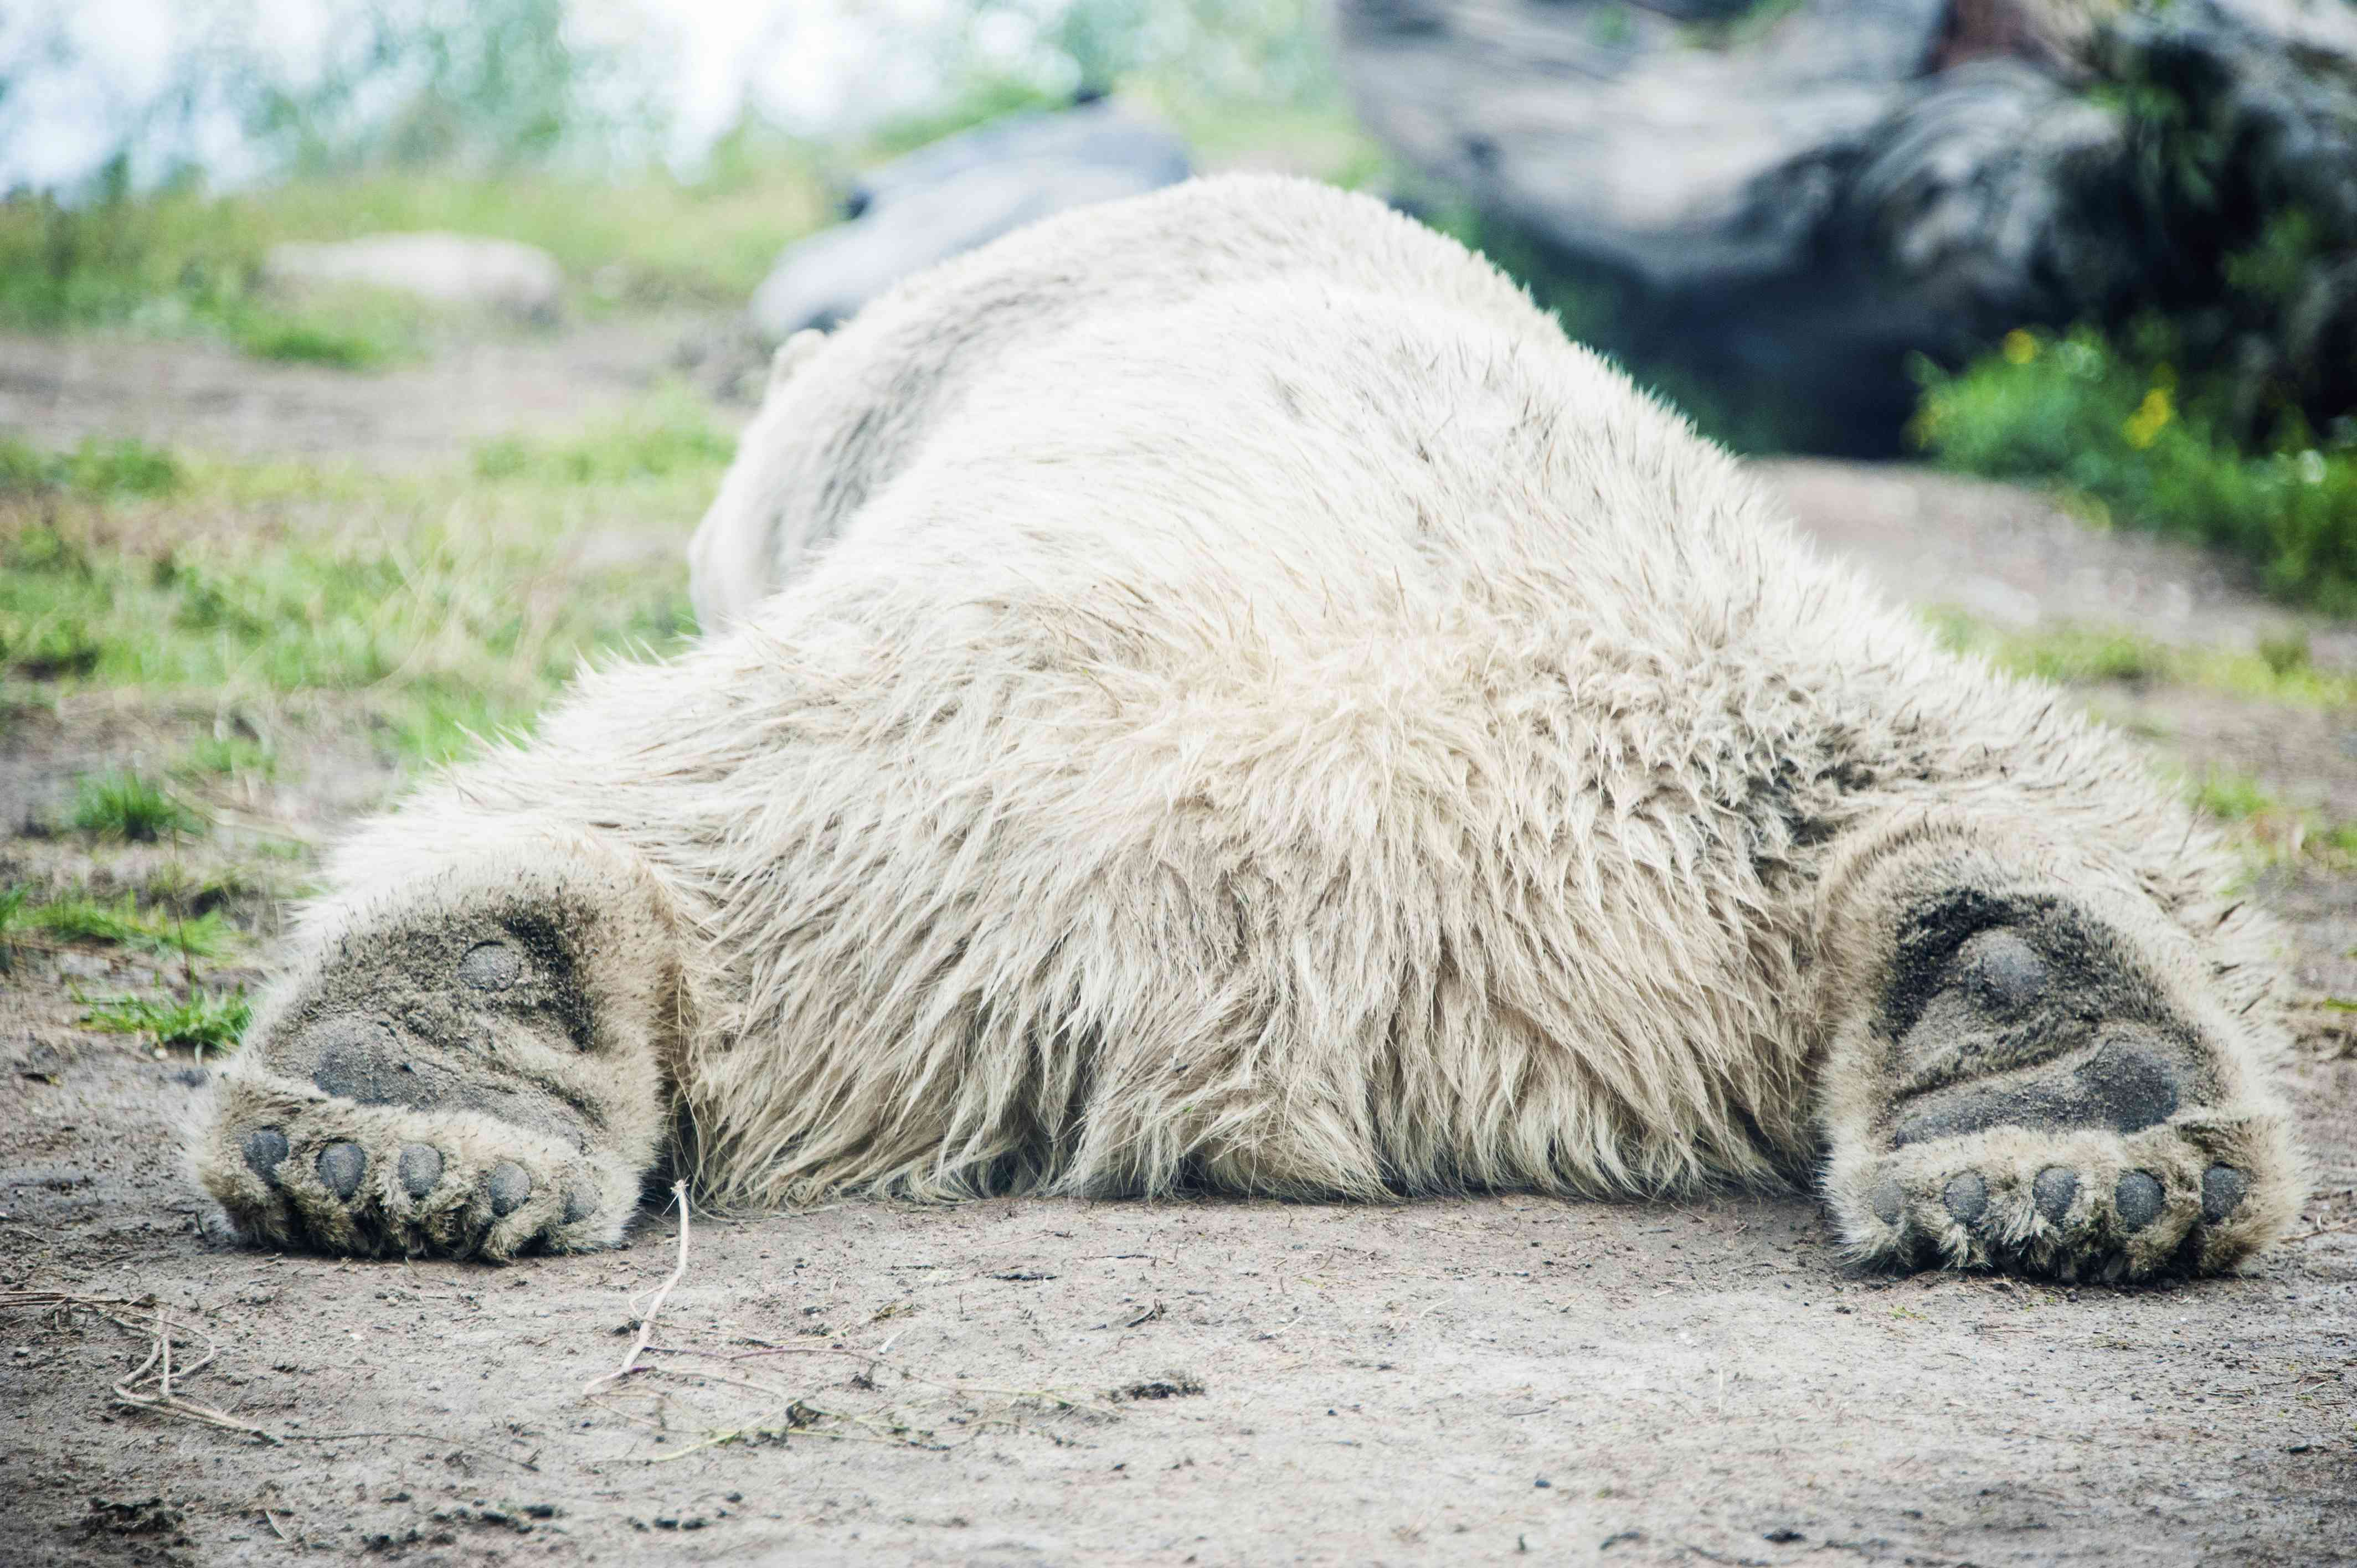 huge polar bear sprawled on ground